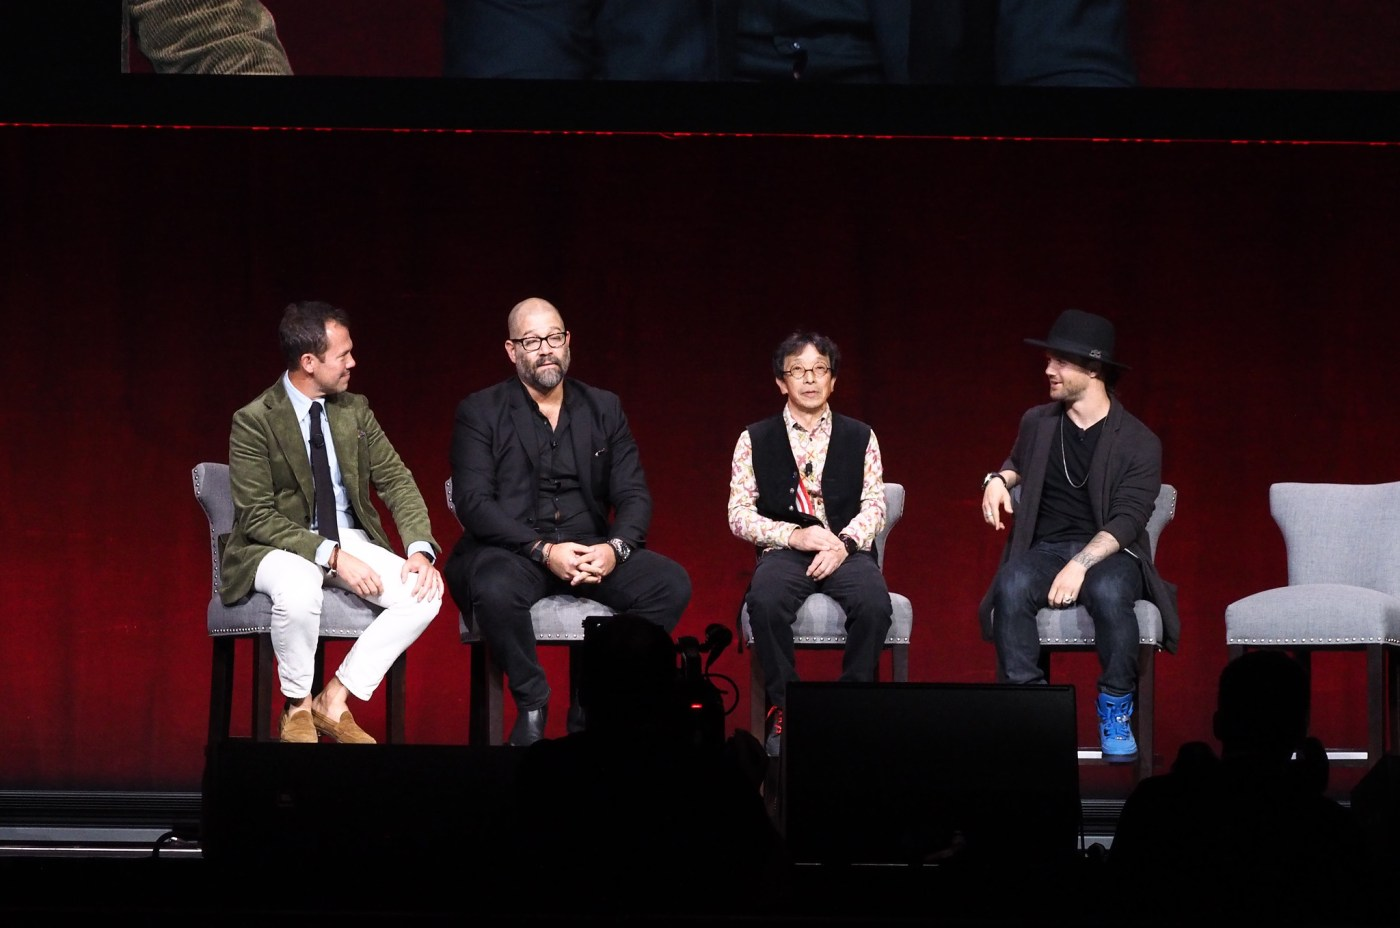 G-Shock 35th Anniversary event at Madison Square Garden November 2017. Left to right: Matt Hranek, Adam Craniotes, Kikuo Ibe, Louie Vito